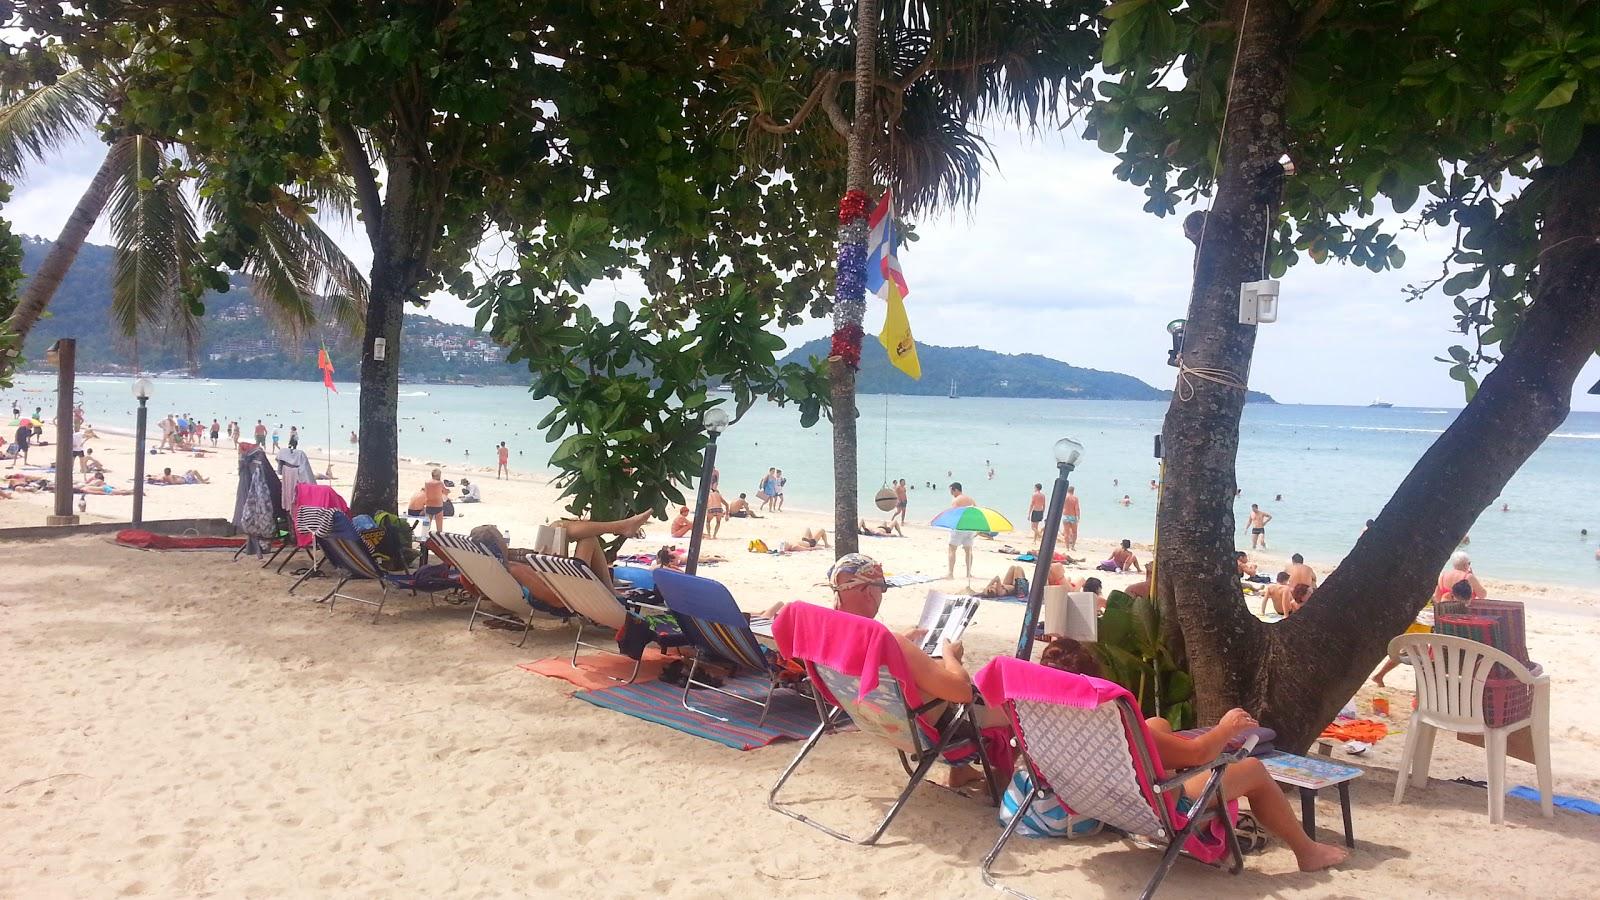 Patong Beach - December 2014